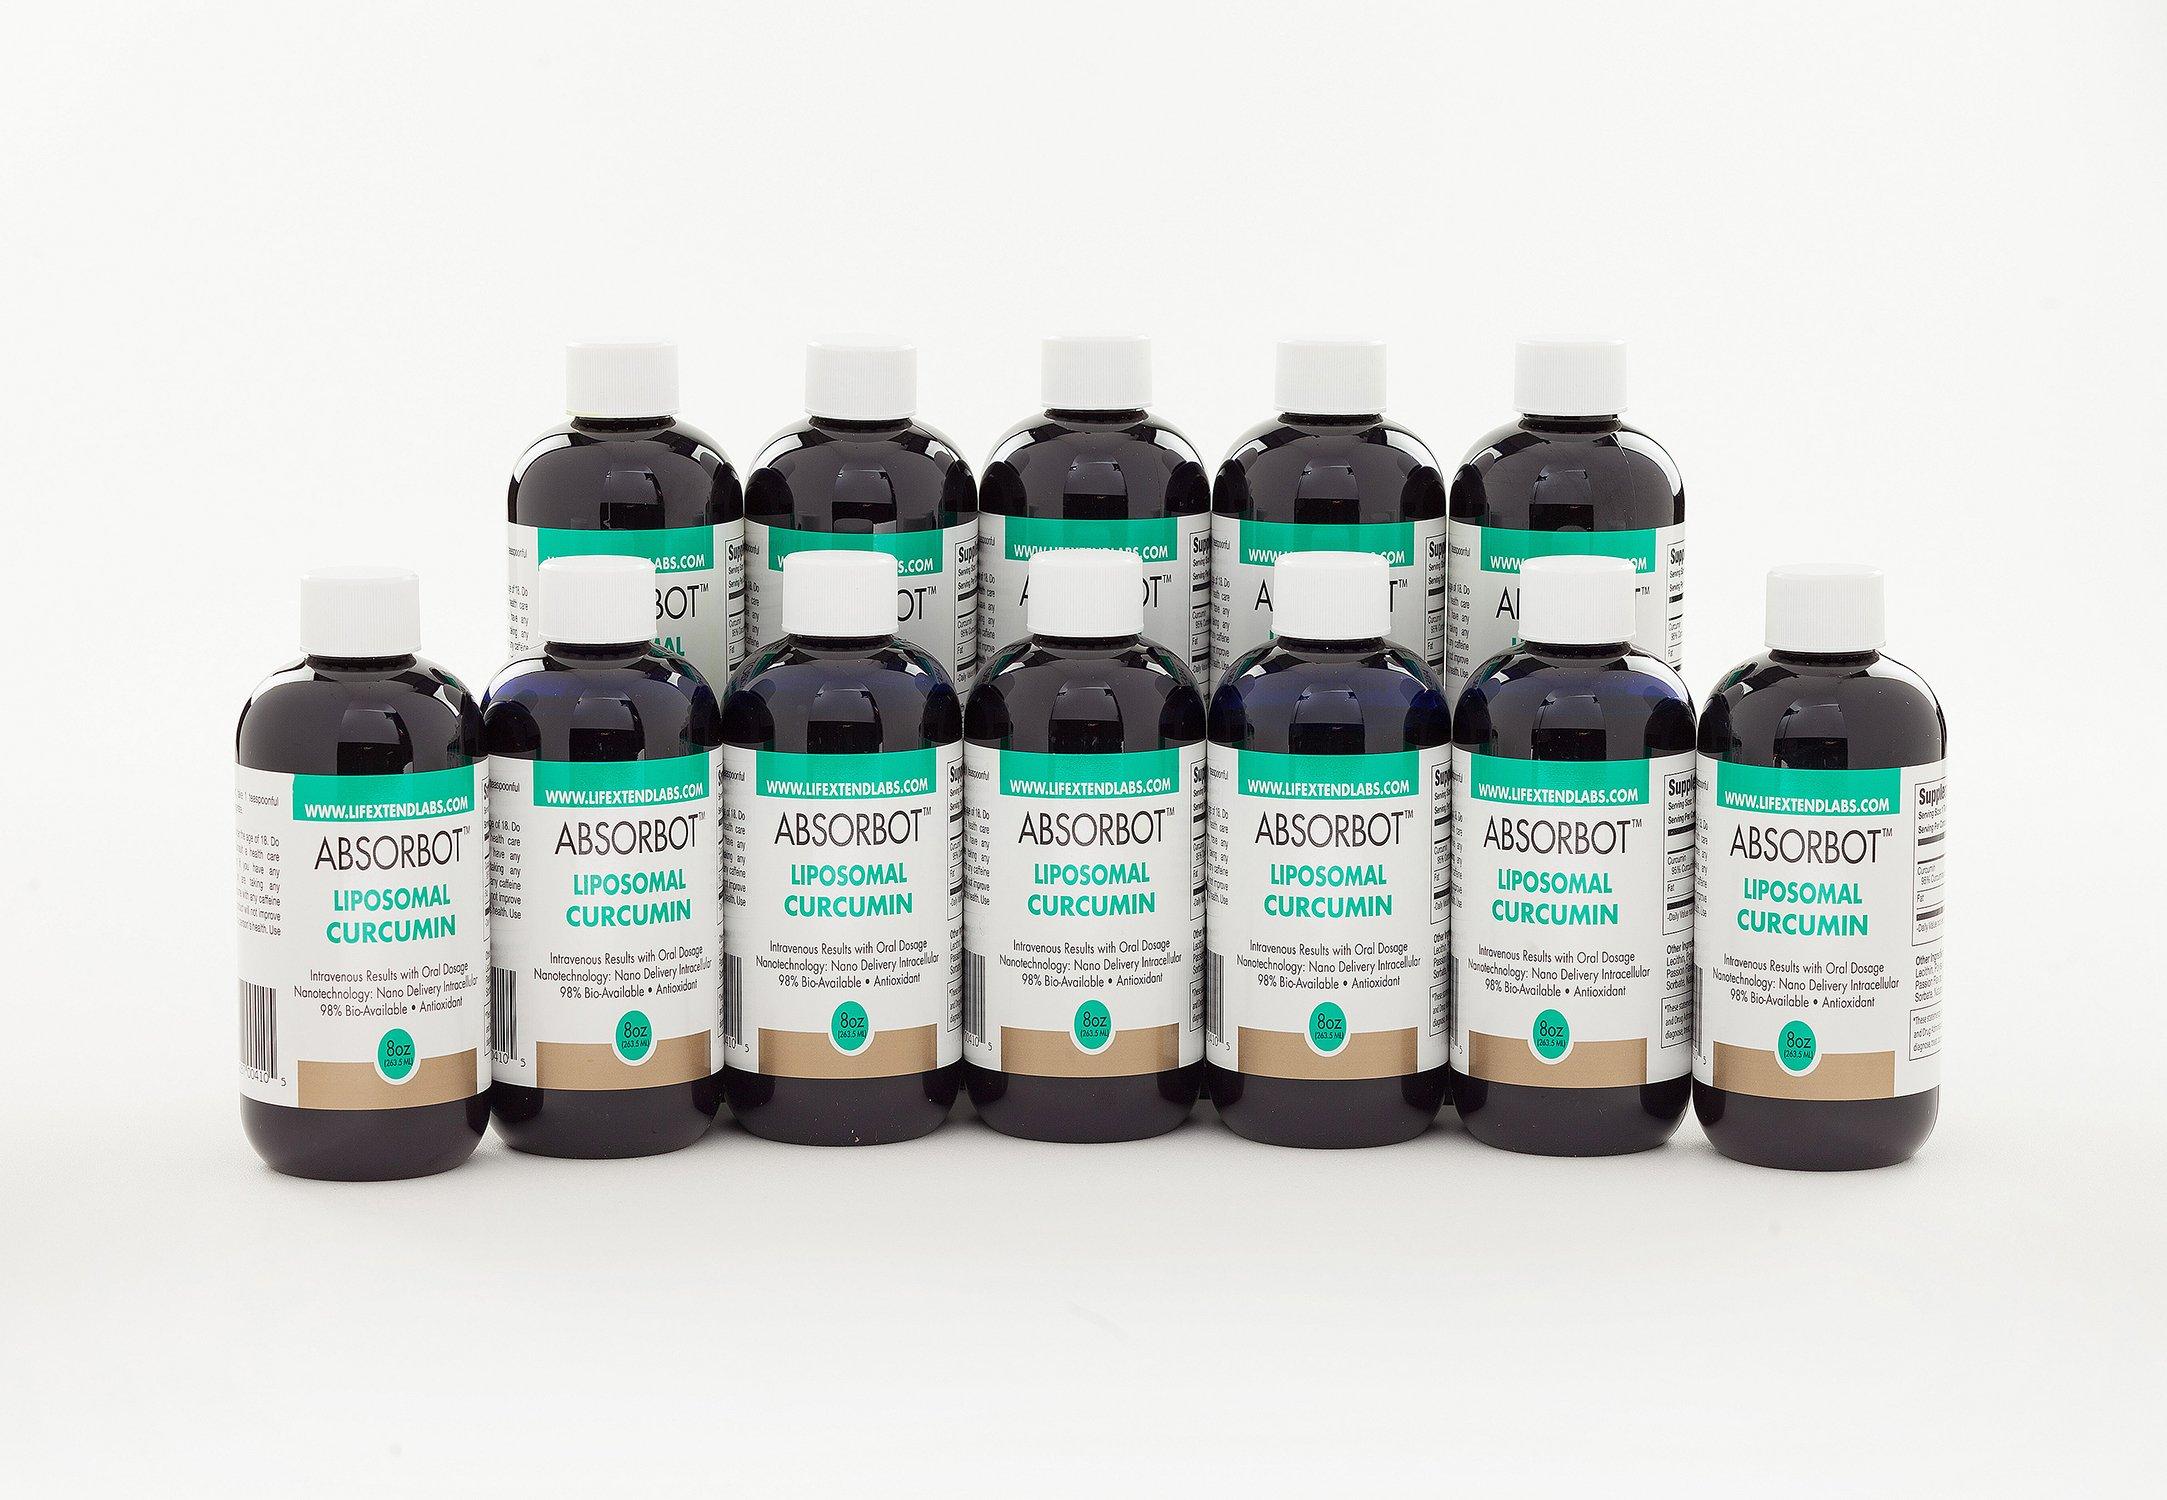 Absorbot Liposomal Curcumin (Turmeric), Case of 12 bottles, Maximum Bio Availability